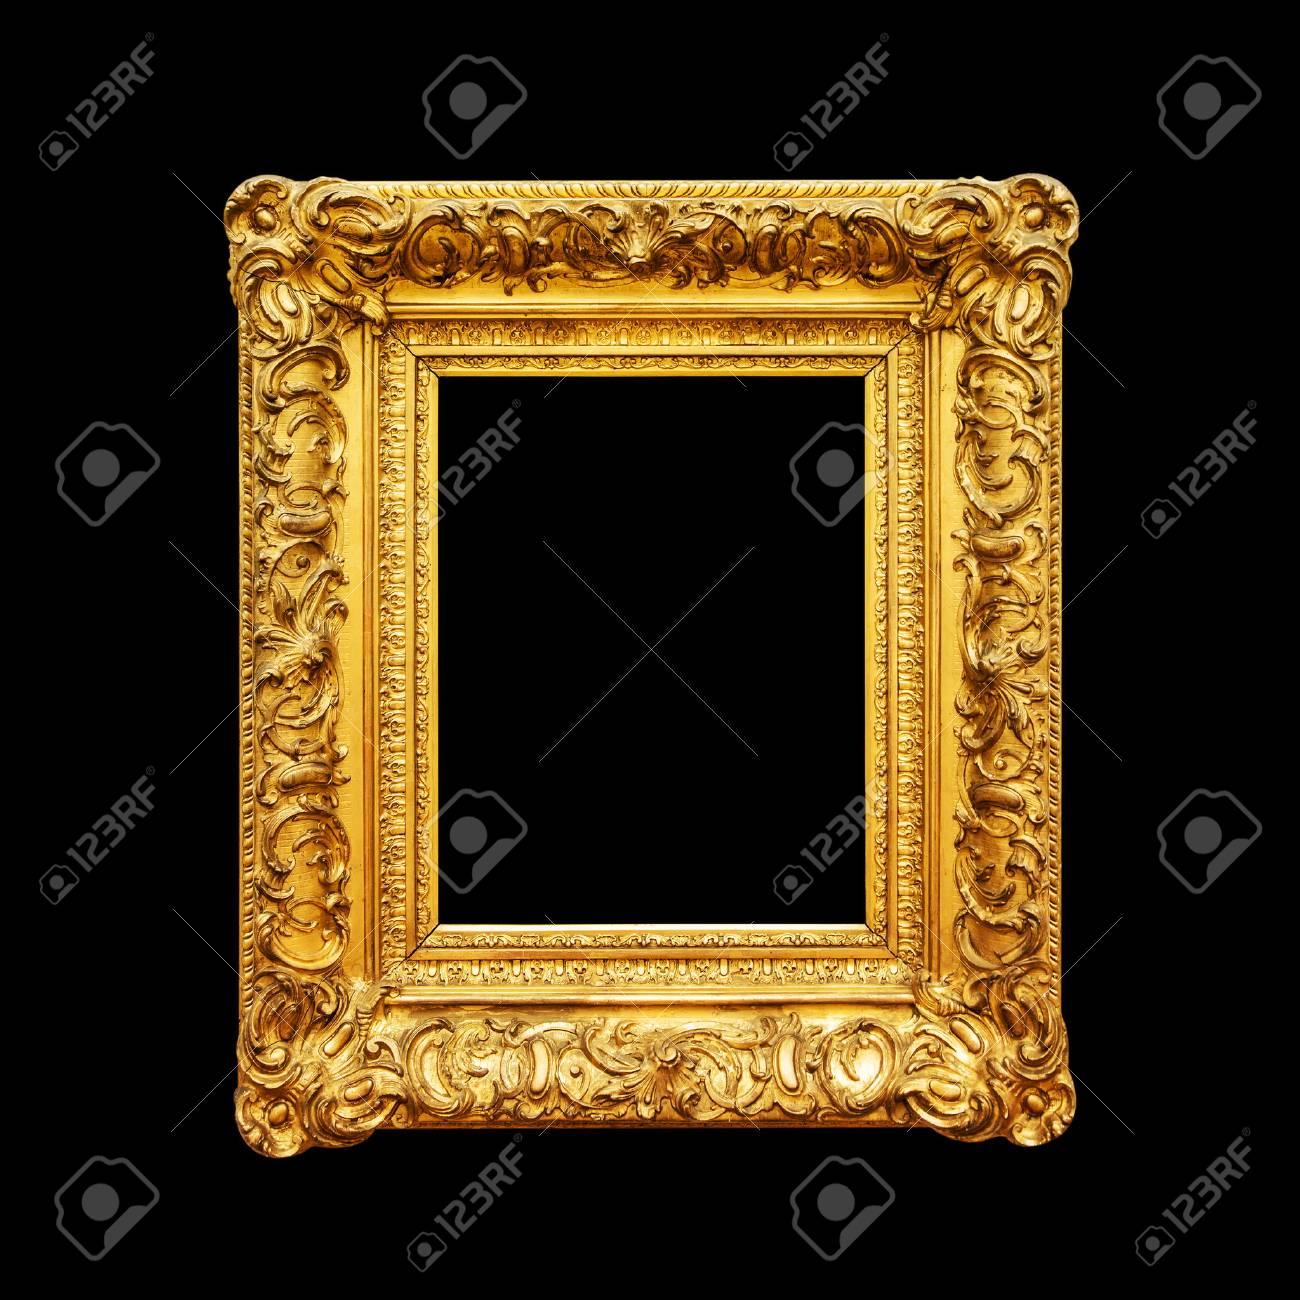 5f8d19e31550 Luxury ornate portrait frame isolated on black background Stock Photo -  88066206